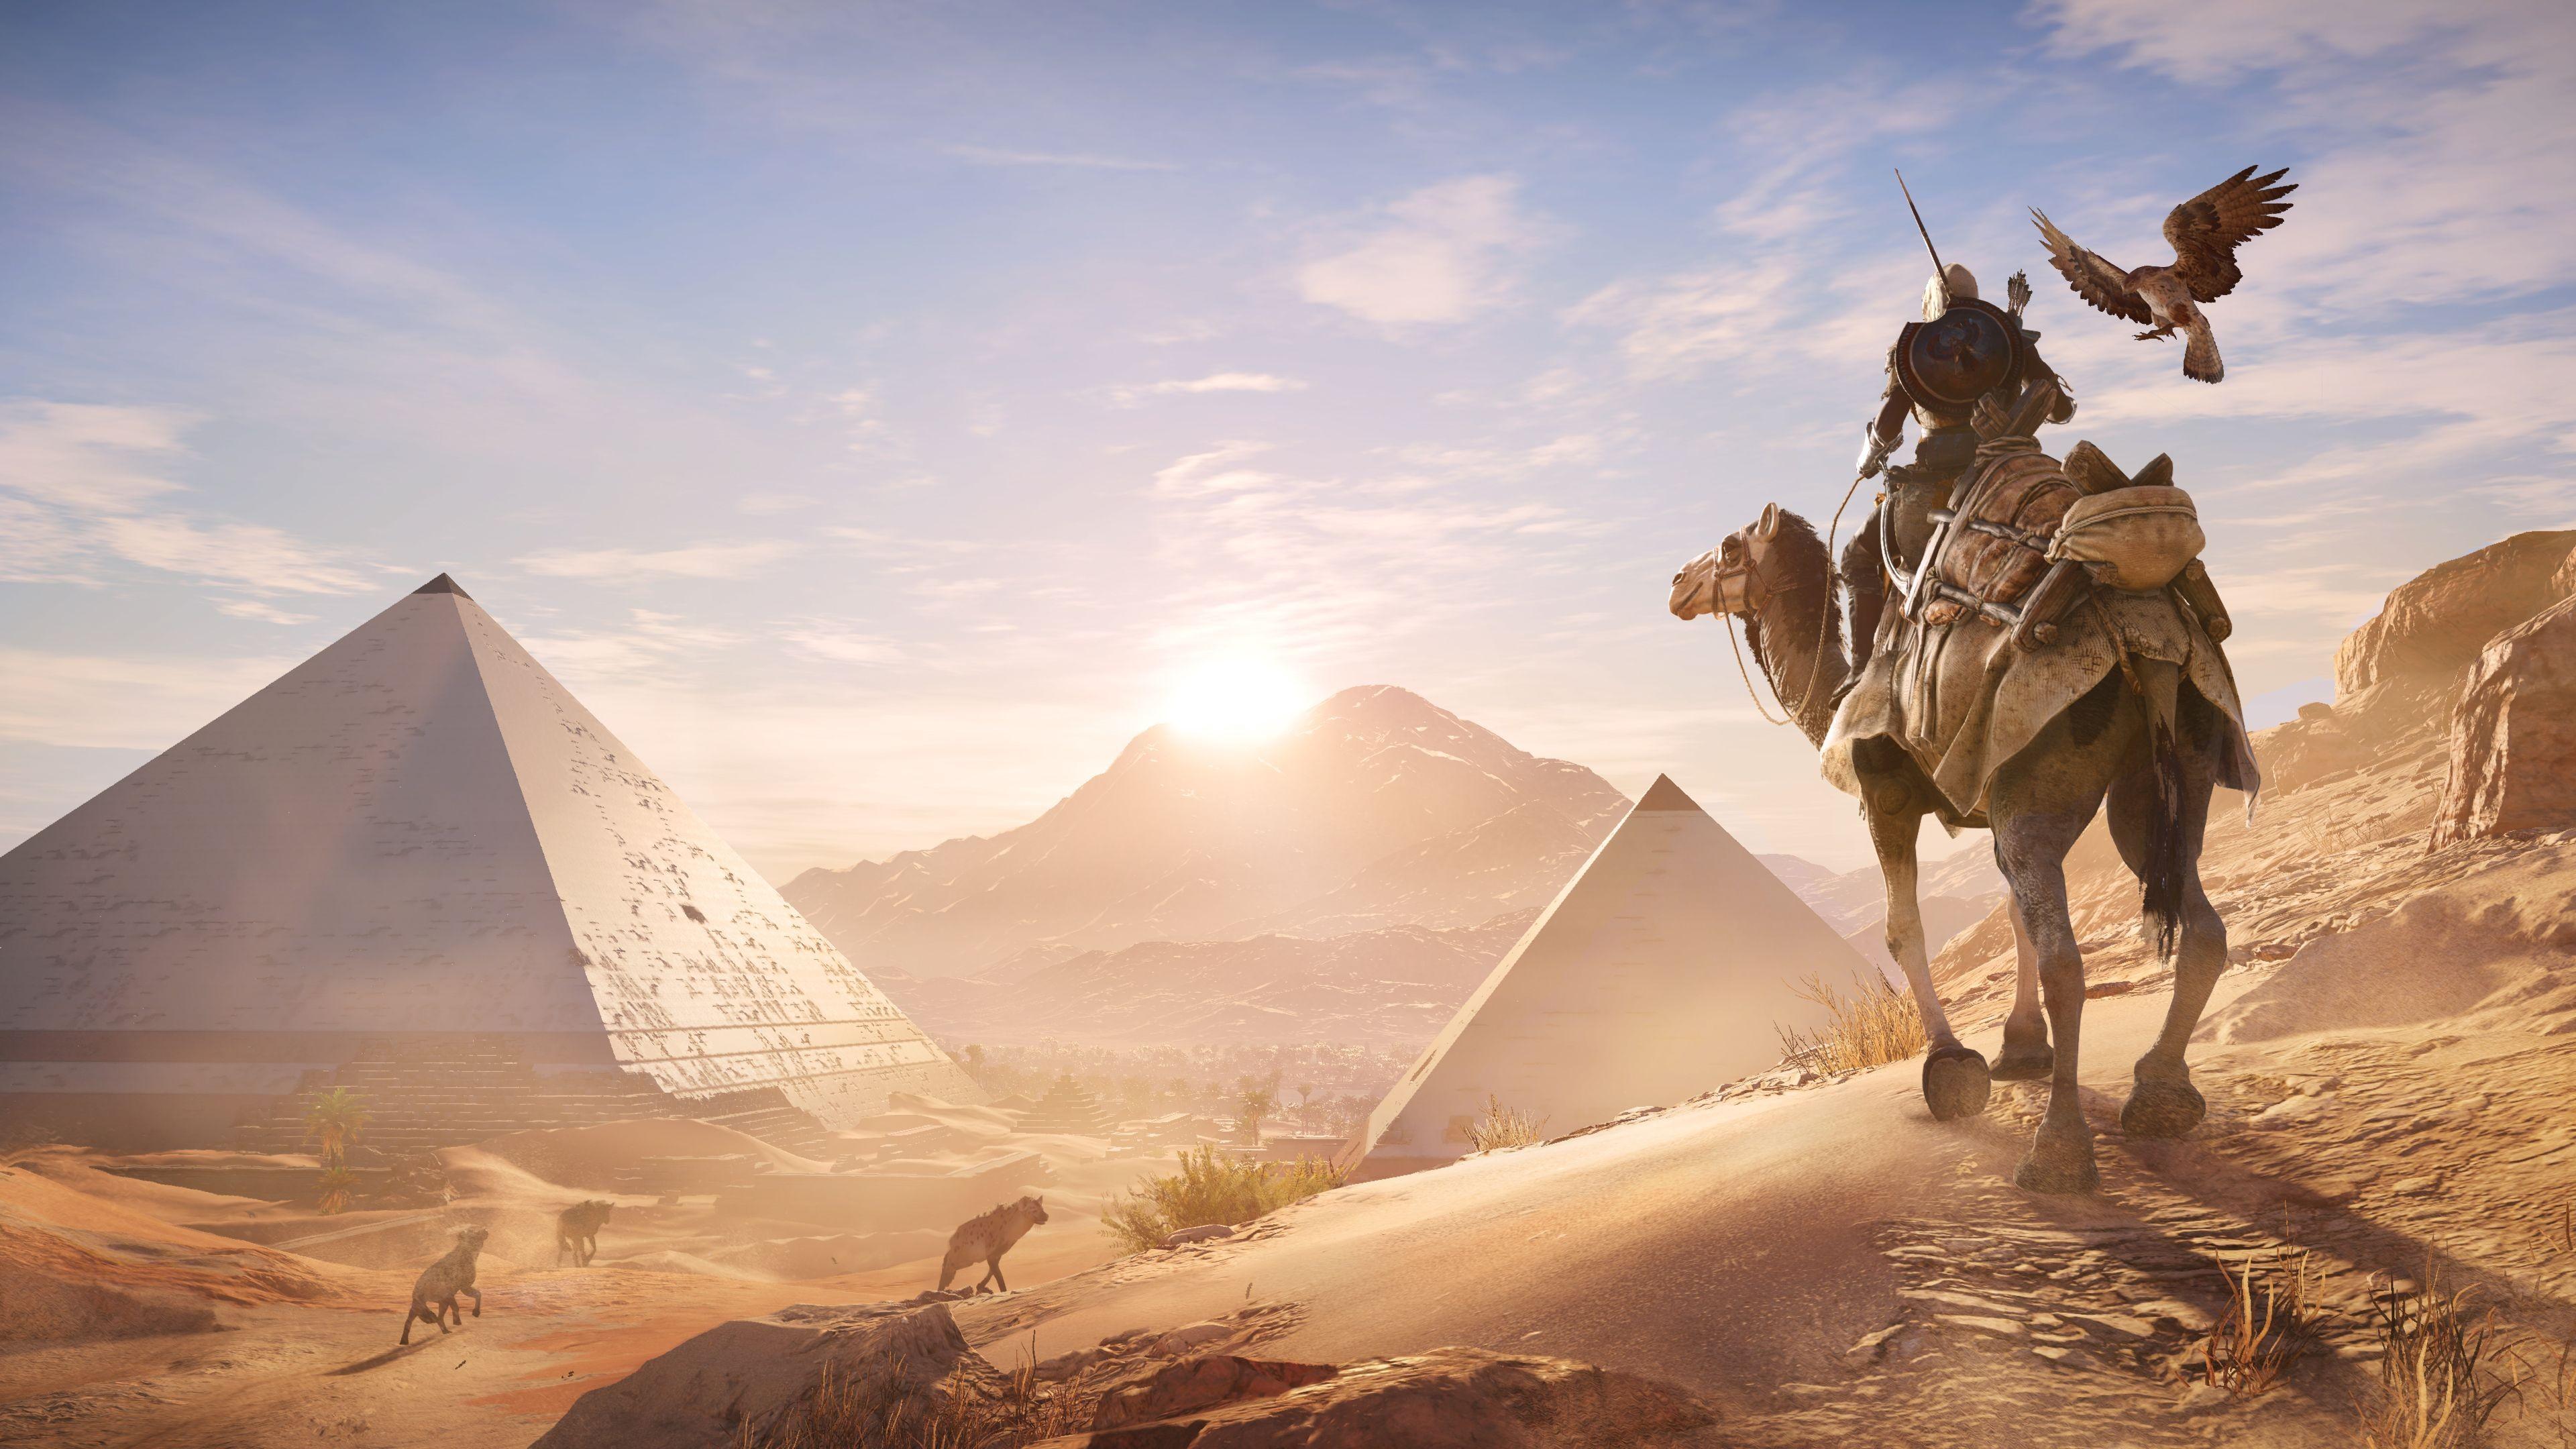 3d Wallpaper Mario Assassins Creed Origins Egypt 4k Wallpapers Hd